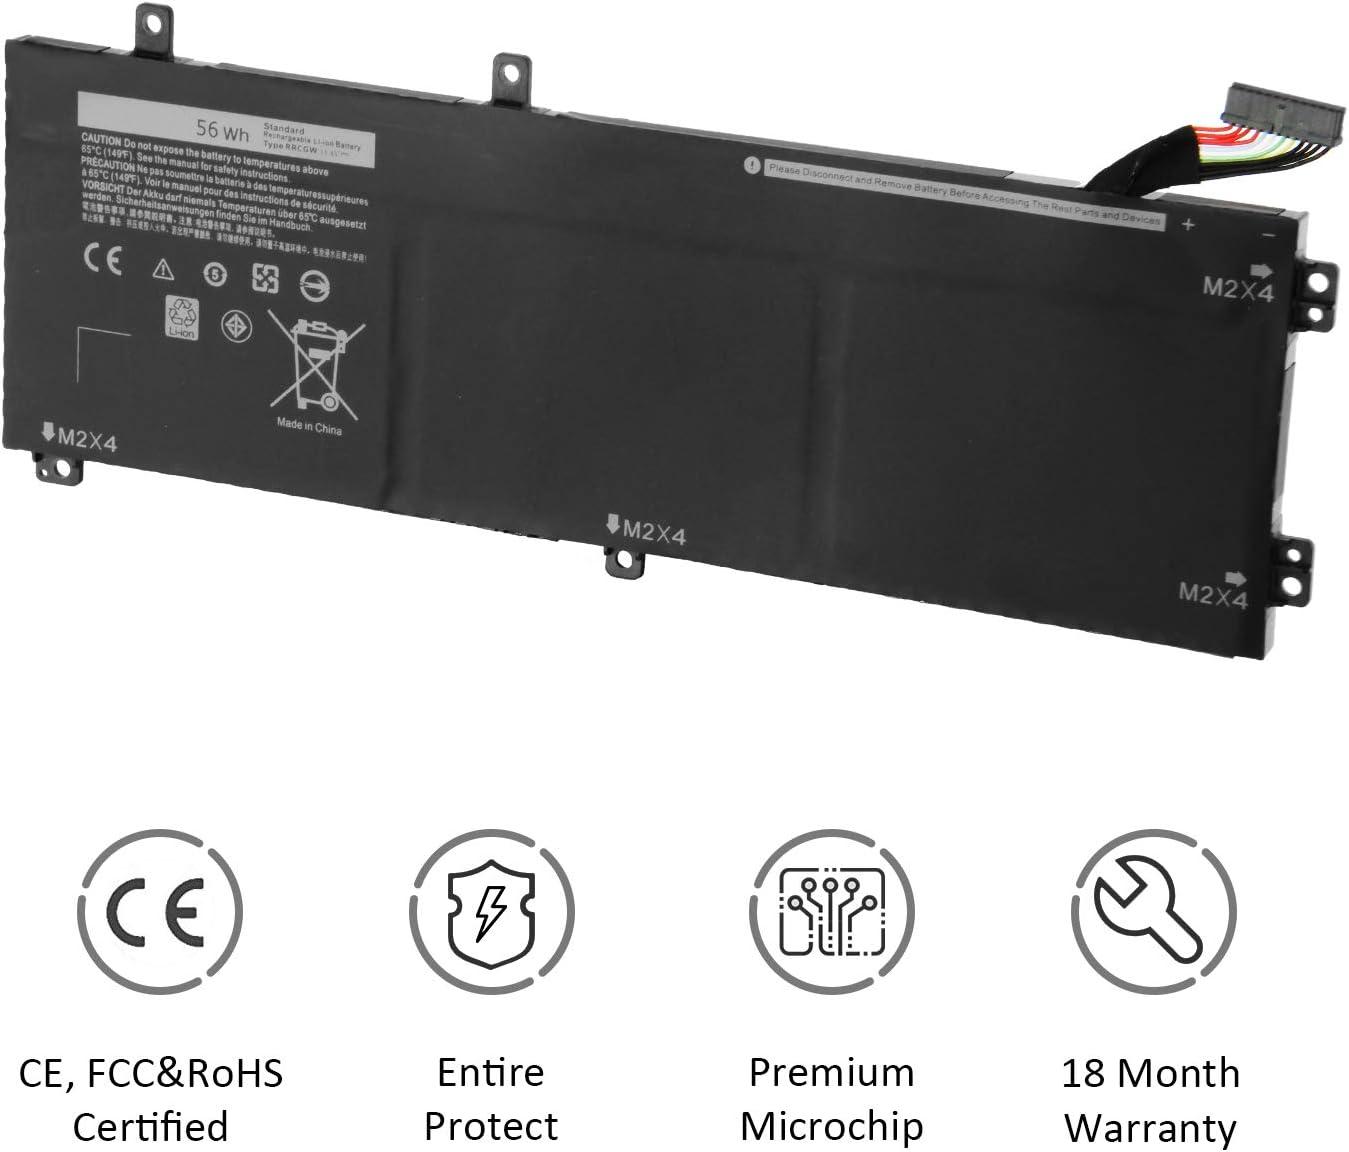 K KYUER 56Wh RRCGW Laptop Battery for Dell XPS 15 9550 Infinity Precision 15 5510 Mobile Workstation 0RRCGW M7R96 62MJV 062MJV 451-BBFM 5D91C 05041C D1828 KHCK5 3-Cell 11.4V Replacement Battery